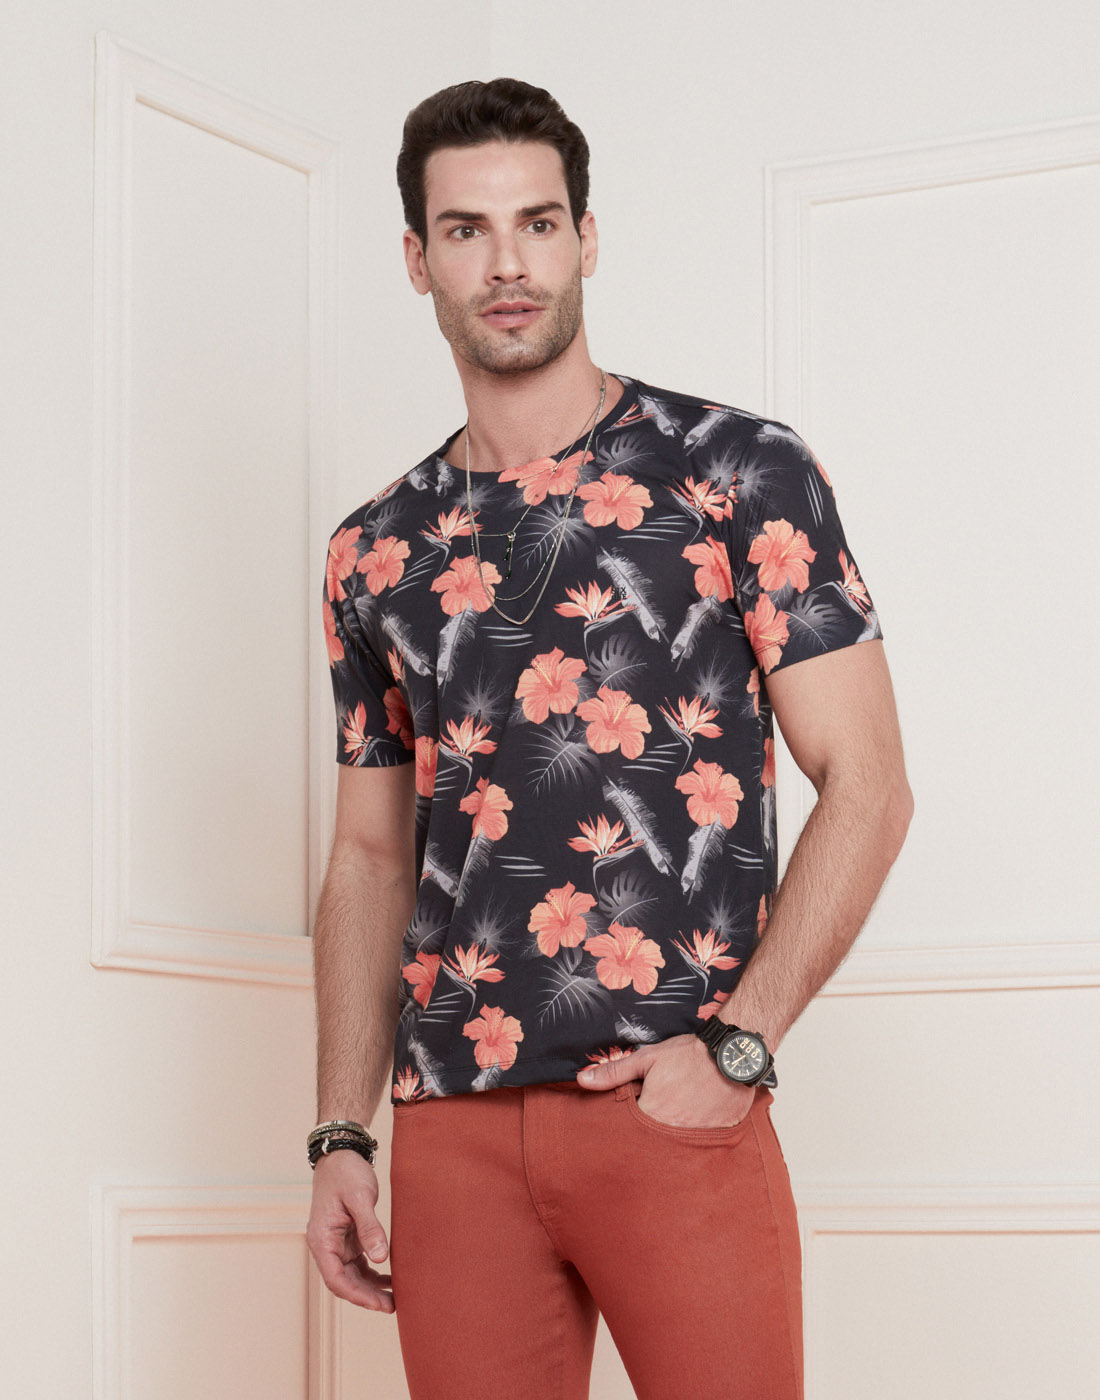 Camiseta Masc. Estampa Tropical Six One